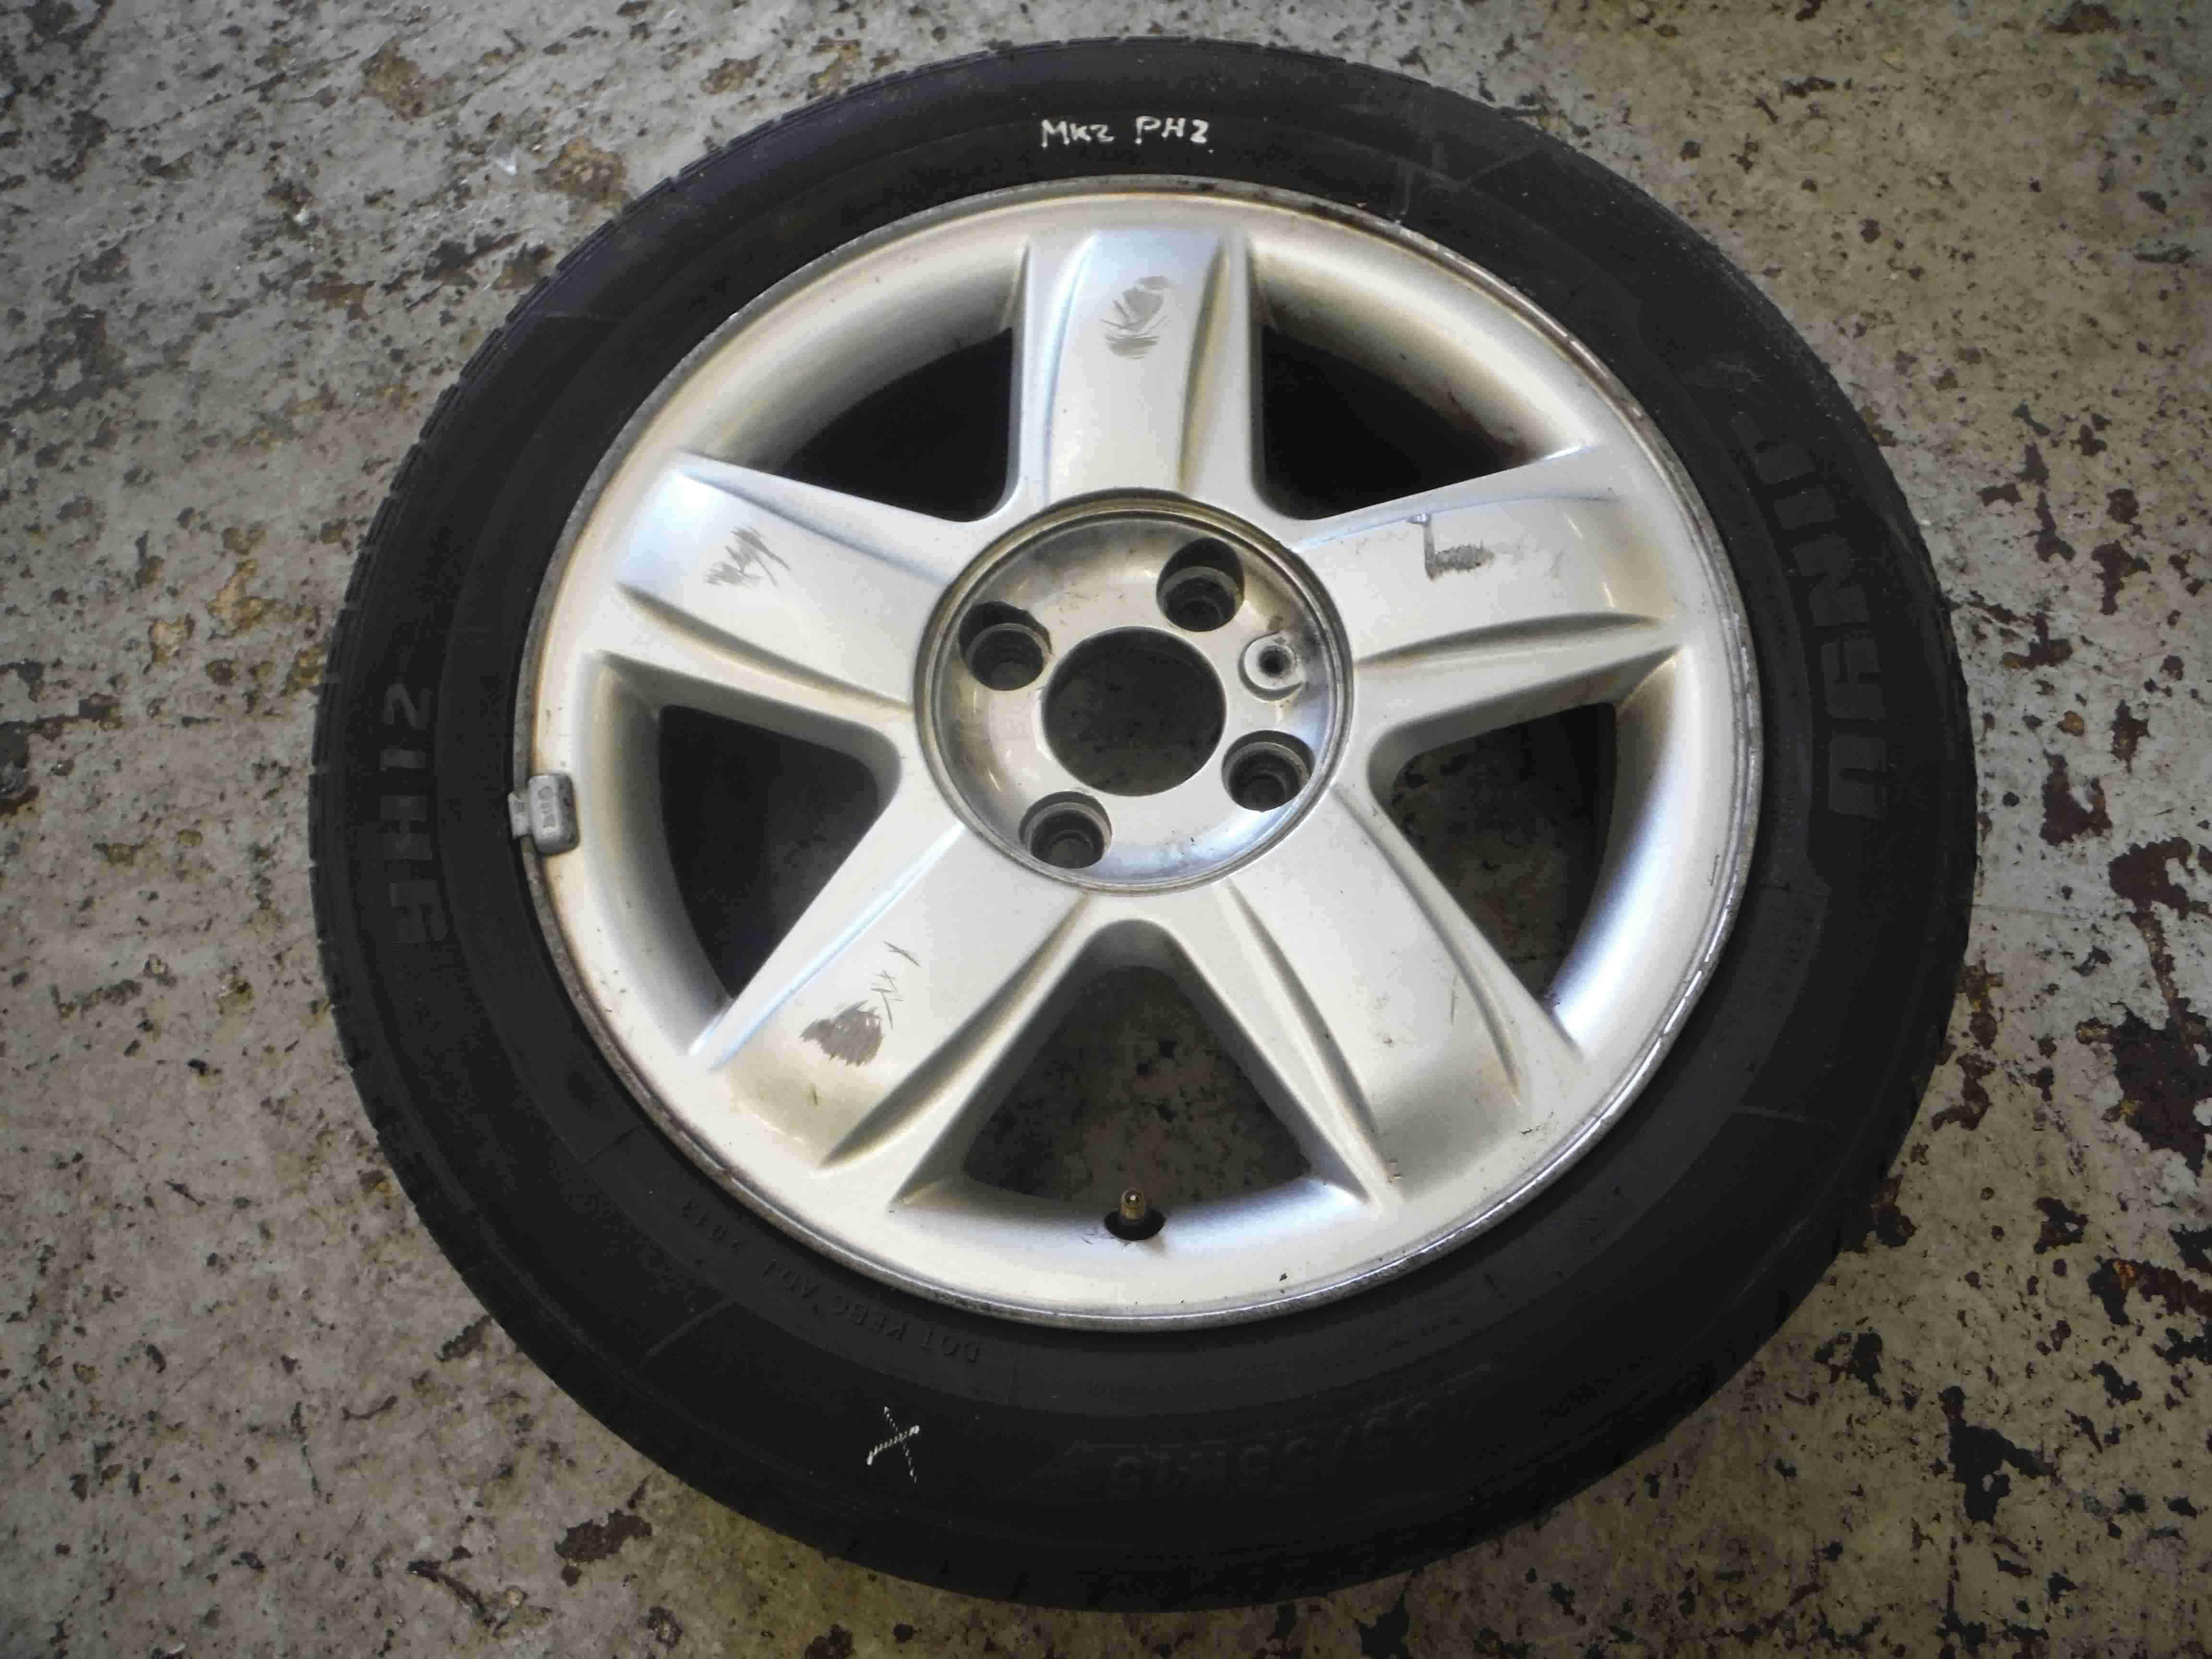 Renault Clio MK2 2001-2006 Alloy Wheel 15inch Dynamique  Tyre 185 55 15 5mm 35